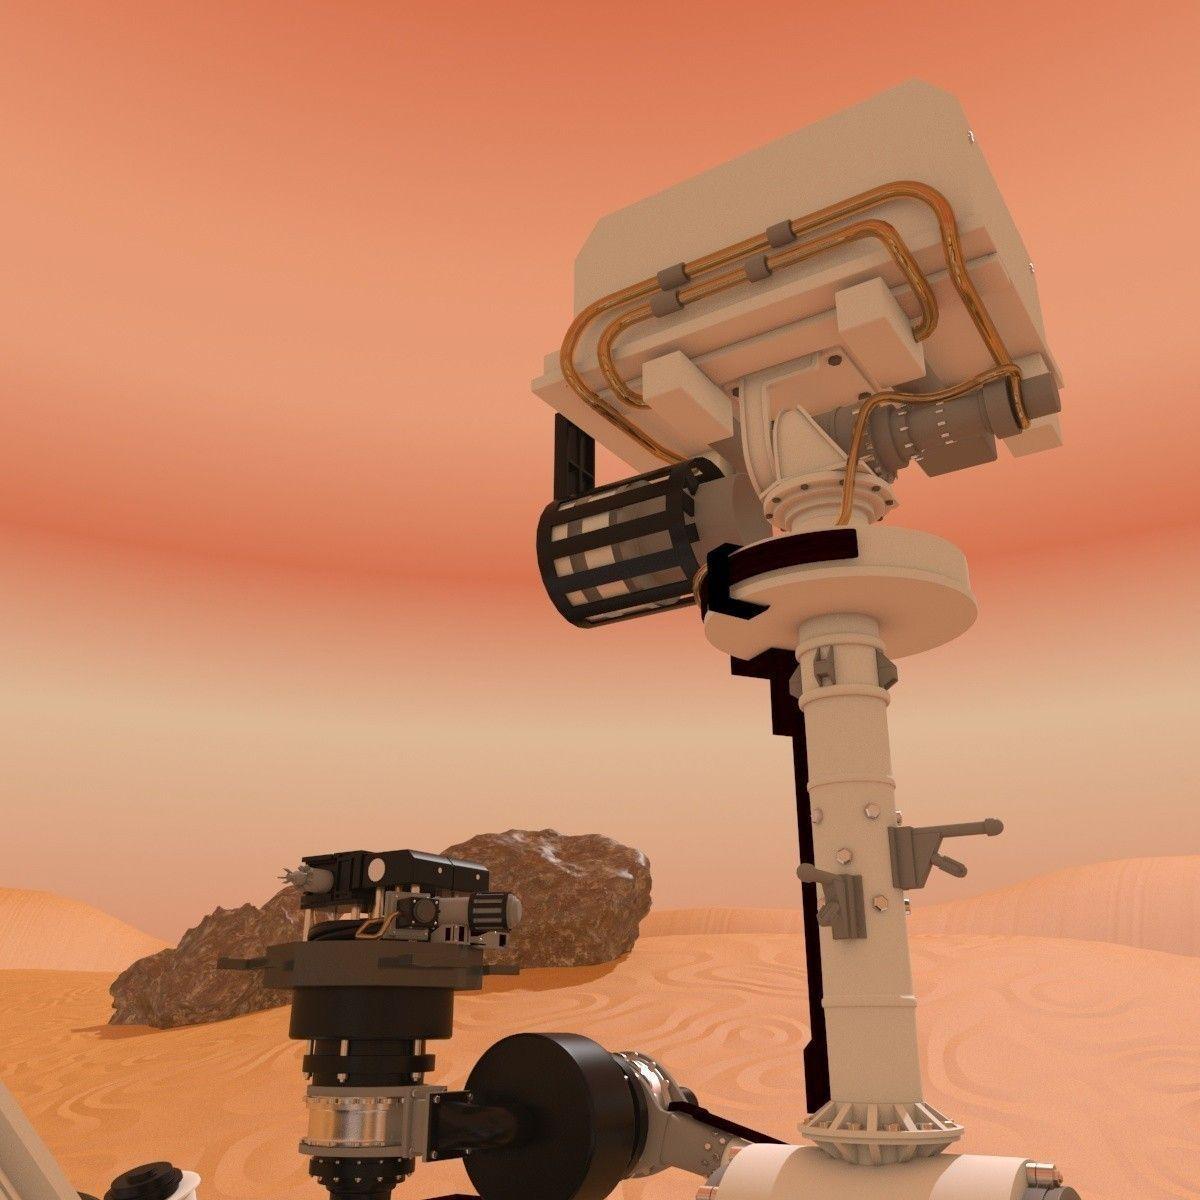 mars curiosity rover scale model - photo #39